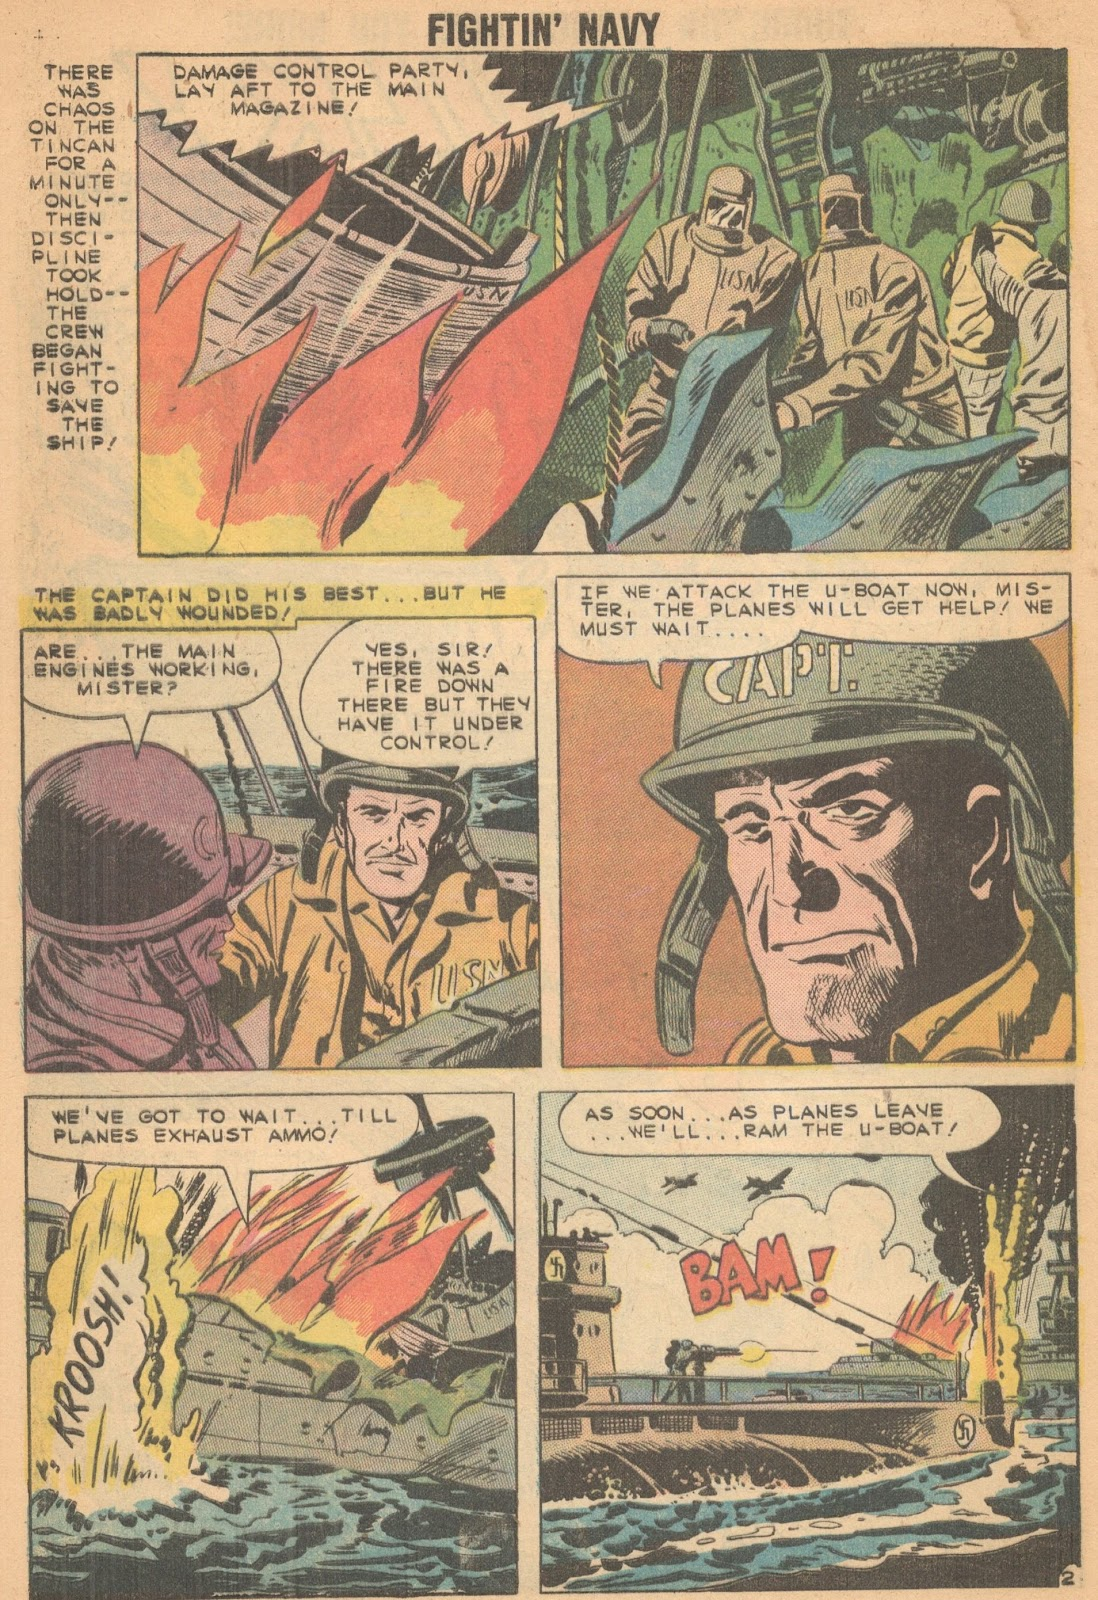 Read online Fightin' Navy comic -  Issue #90 - 4